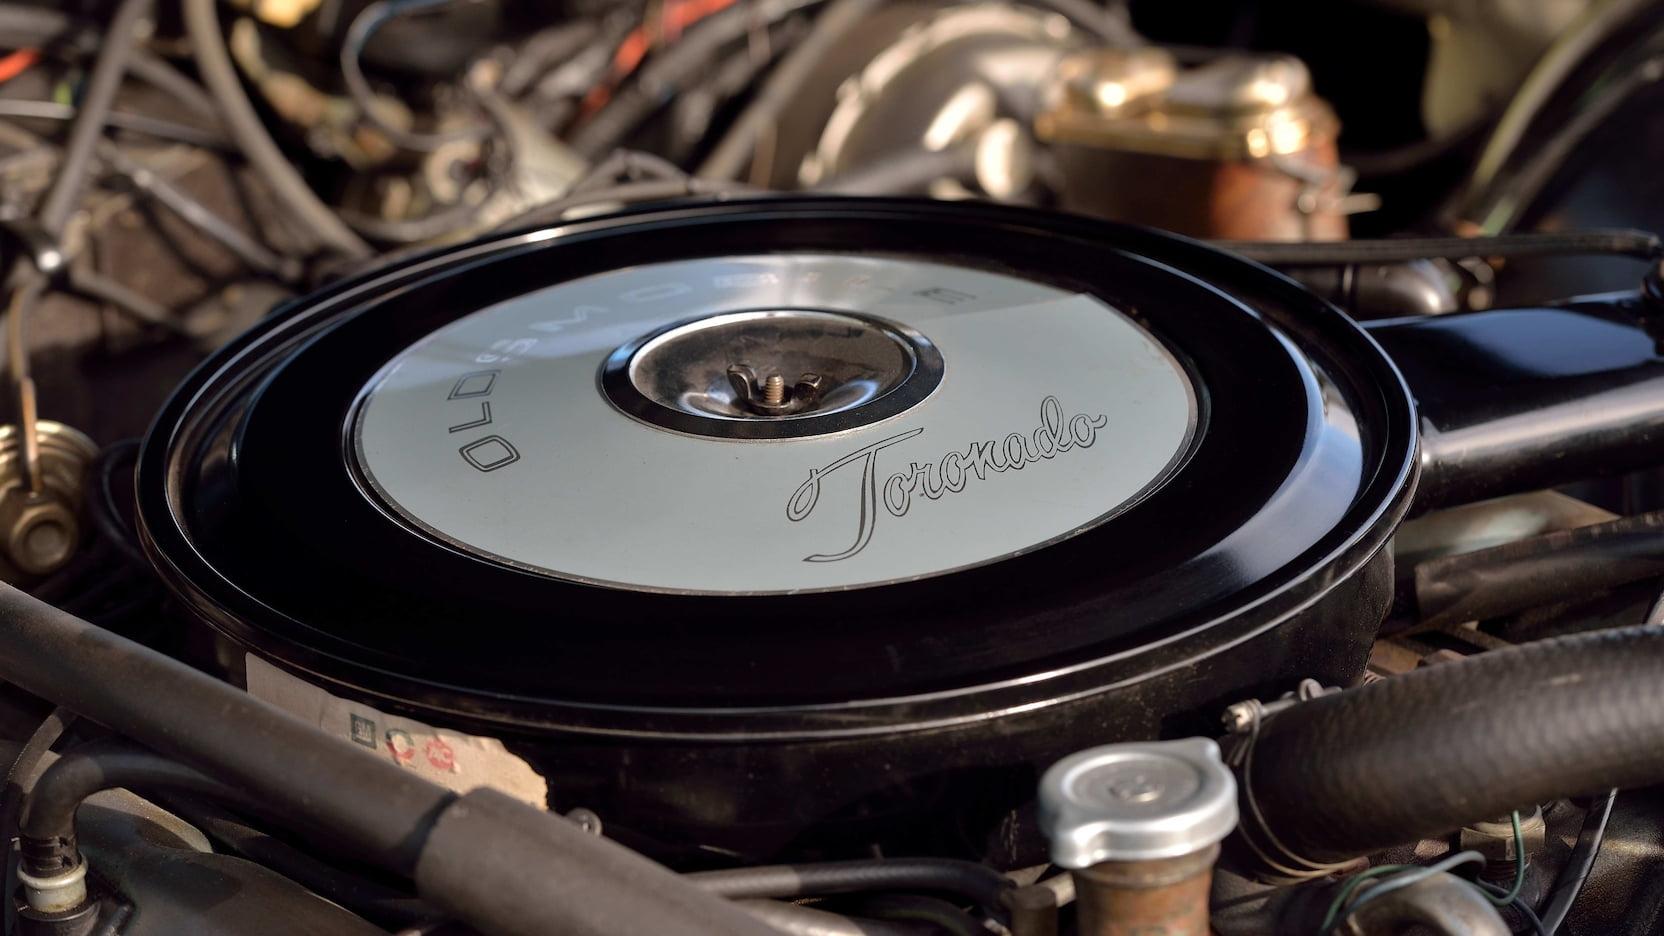 1969 Oldsmobile Toronado engine close up